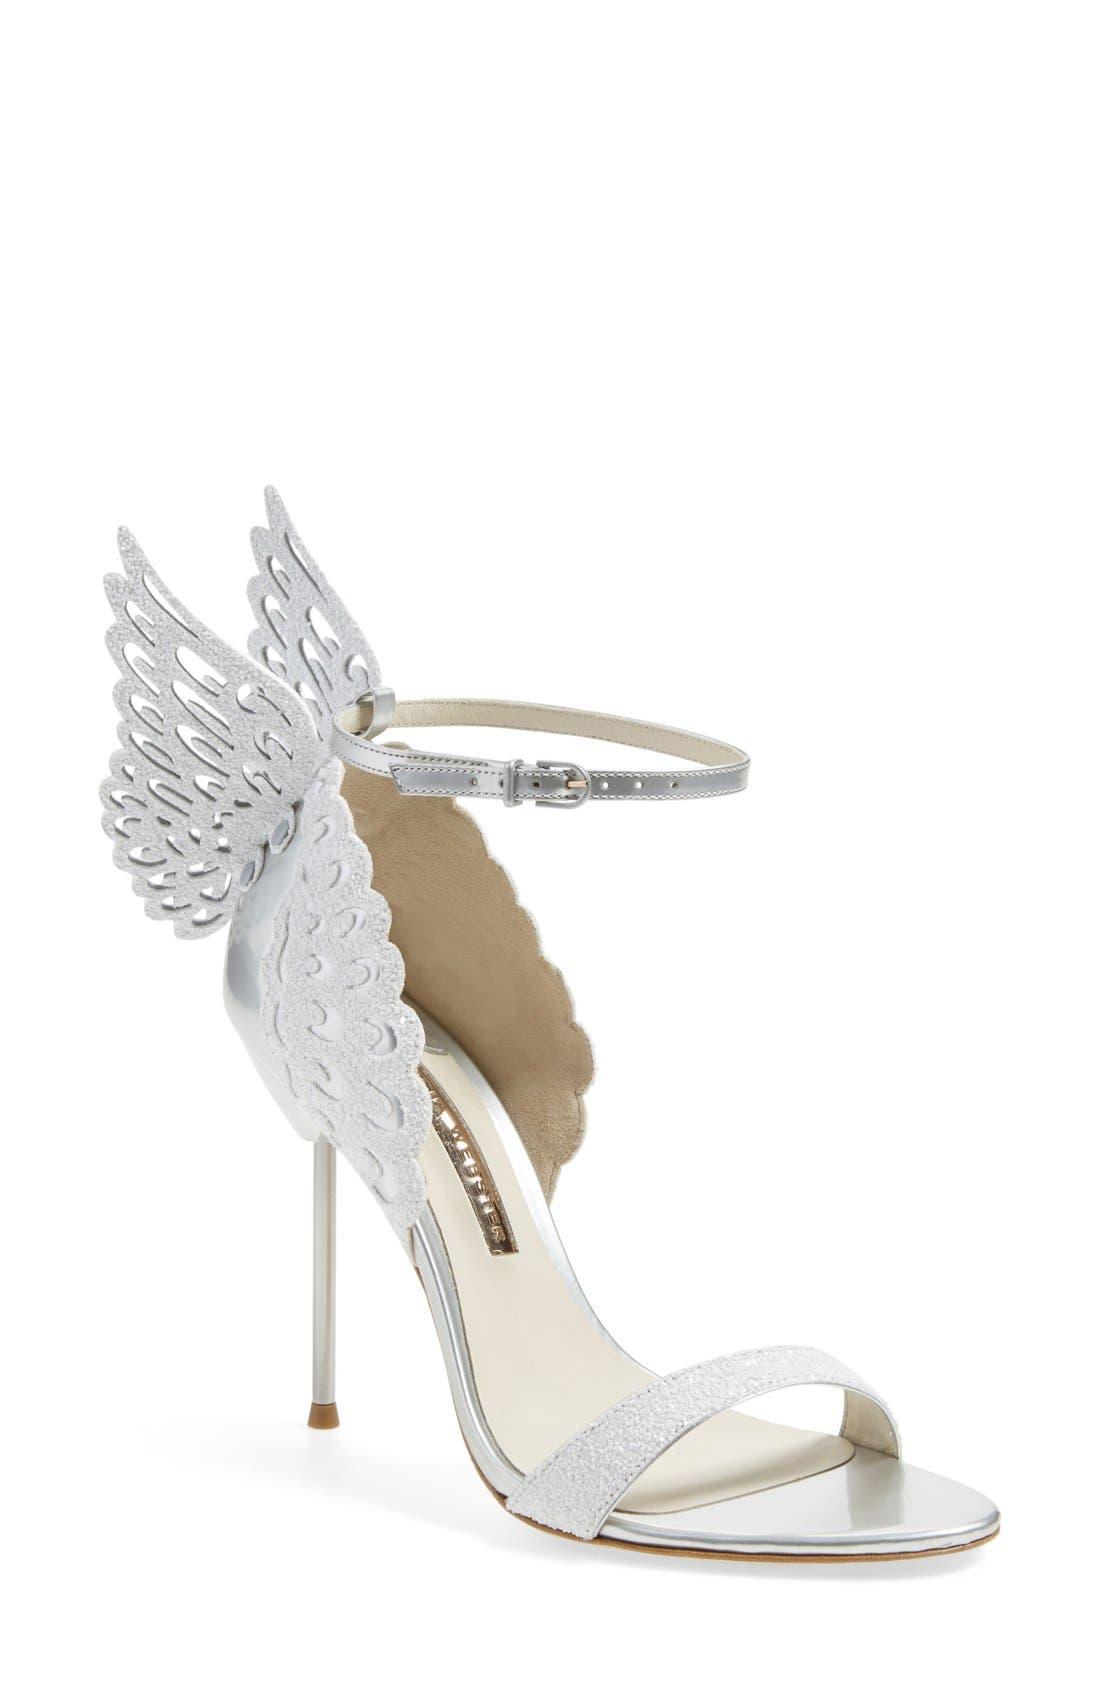 Alternate Image 1 Selected - Sophia Webster 'Evangeline' Ankle Strap Sandal (Women)